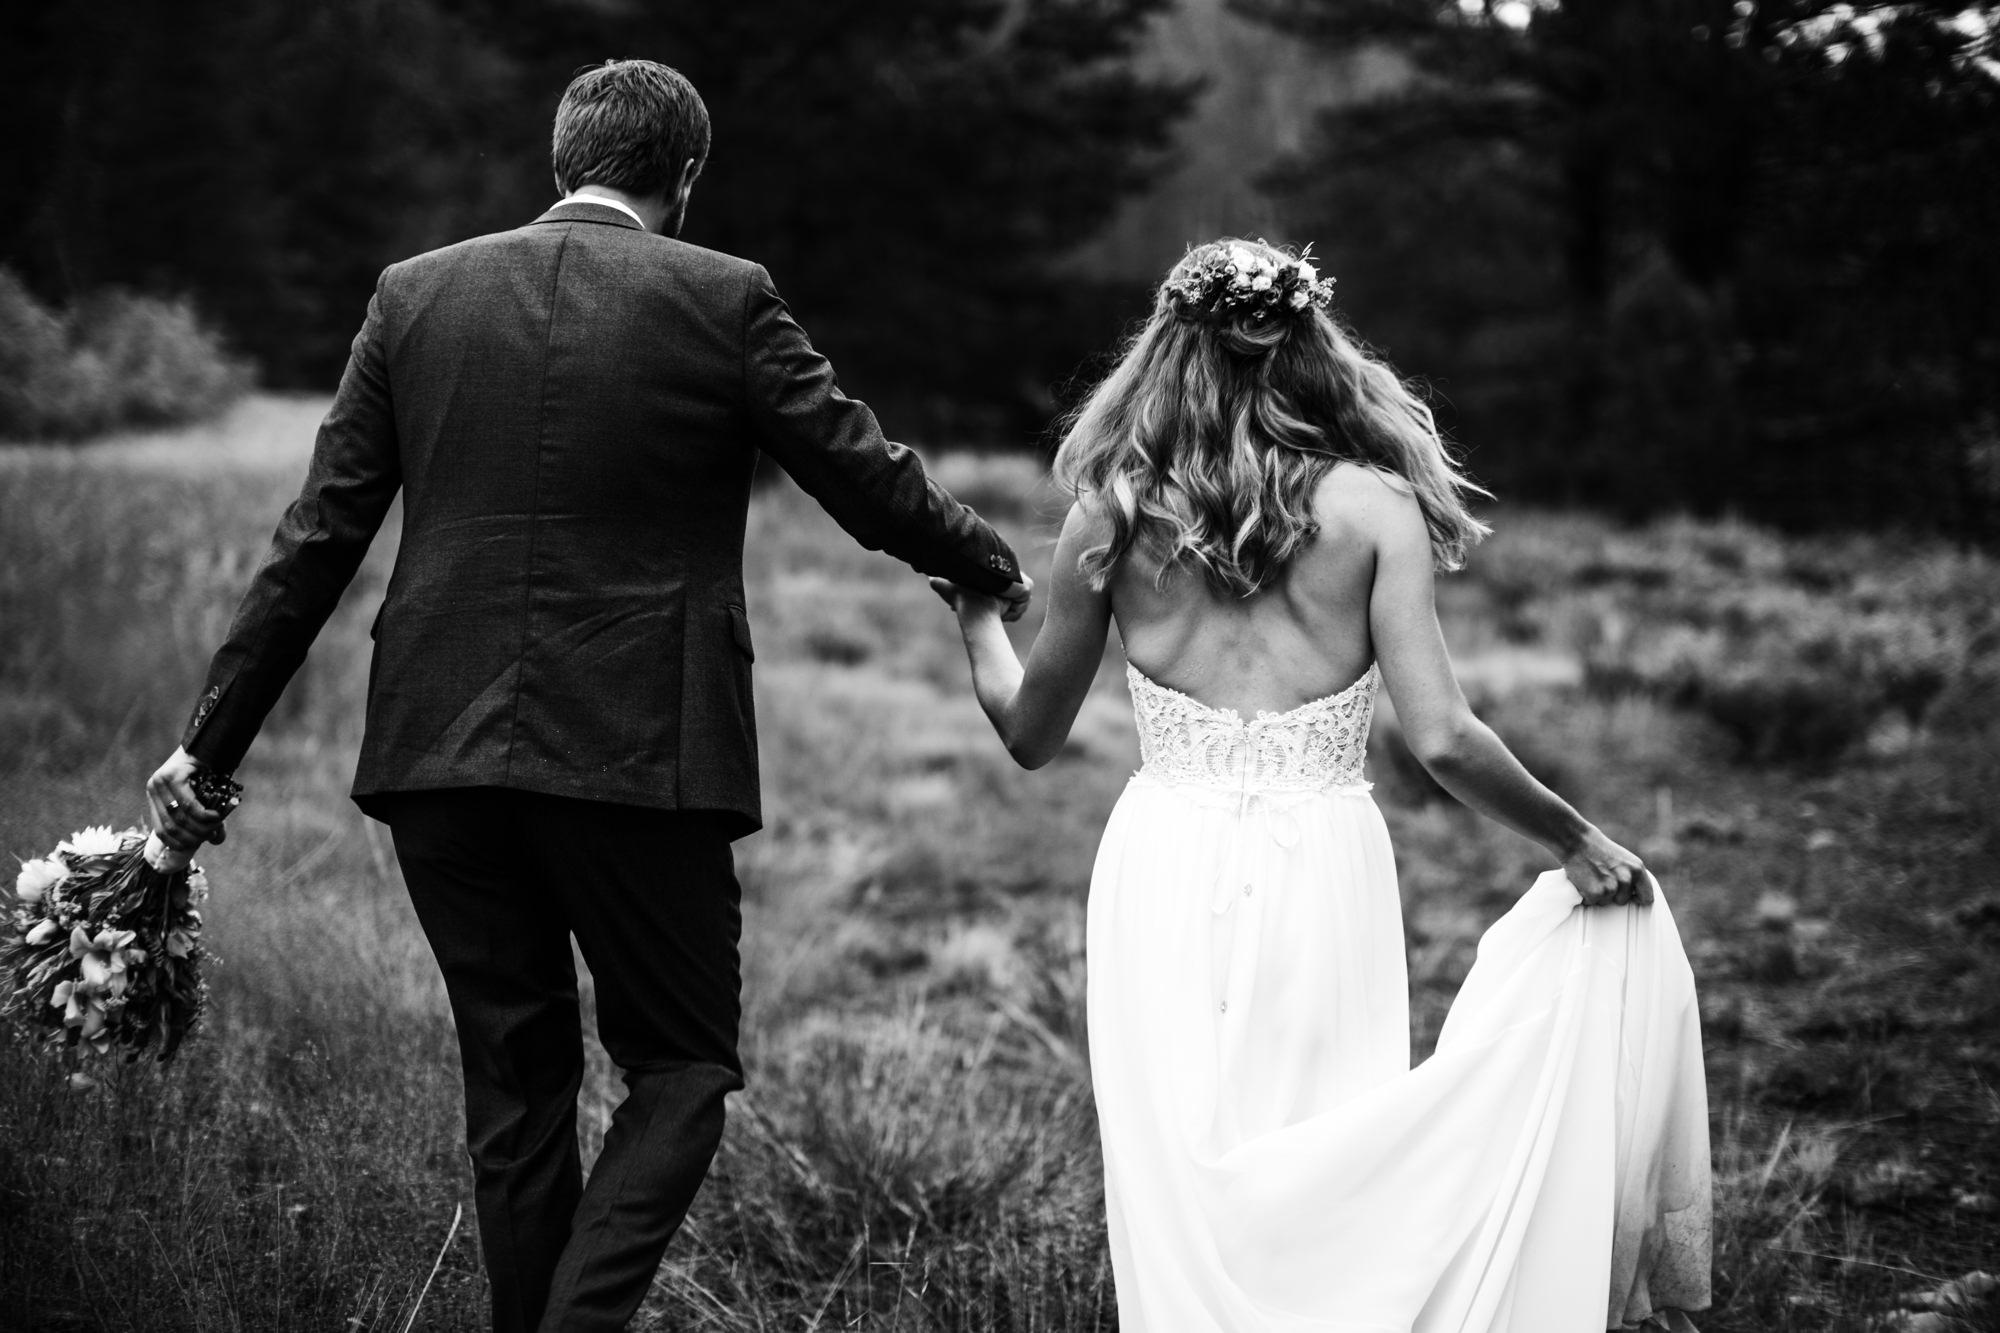 megan + zach's adventurous woodland wedding in truckee, california | romantic rainy wedding day inspiration |lake tahoe wedding photographer | www.thehearnes.com